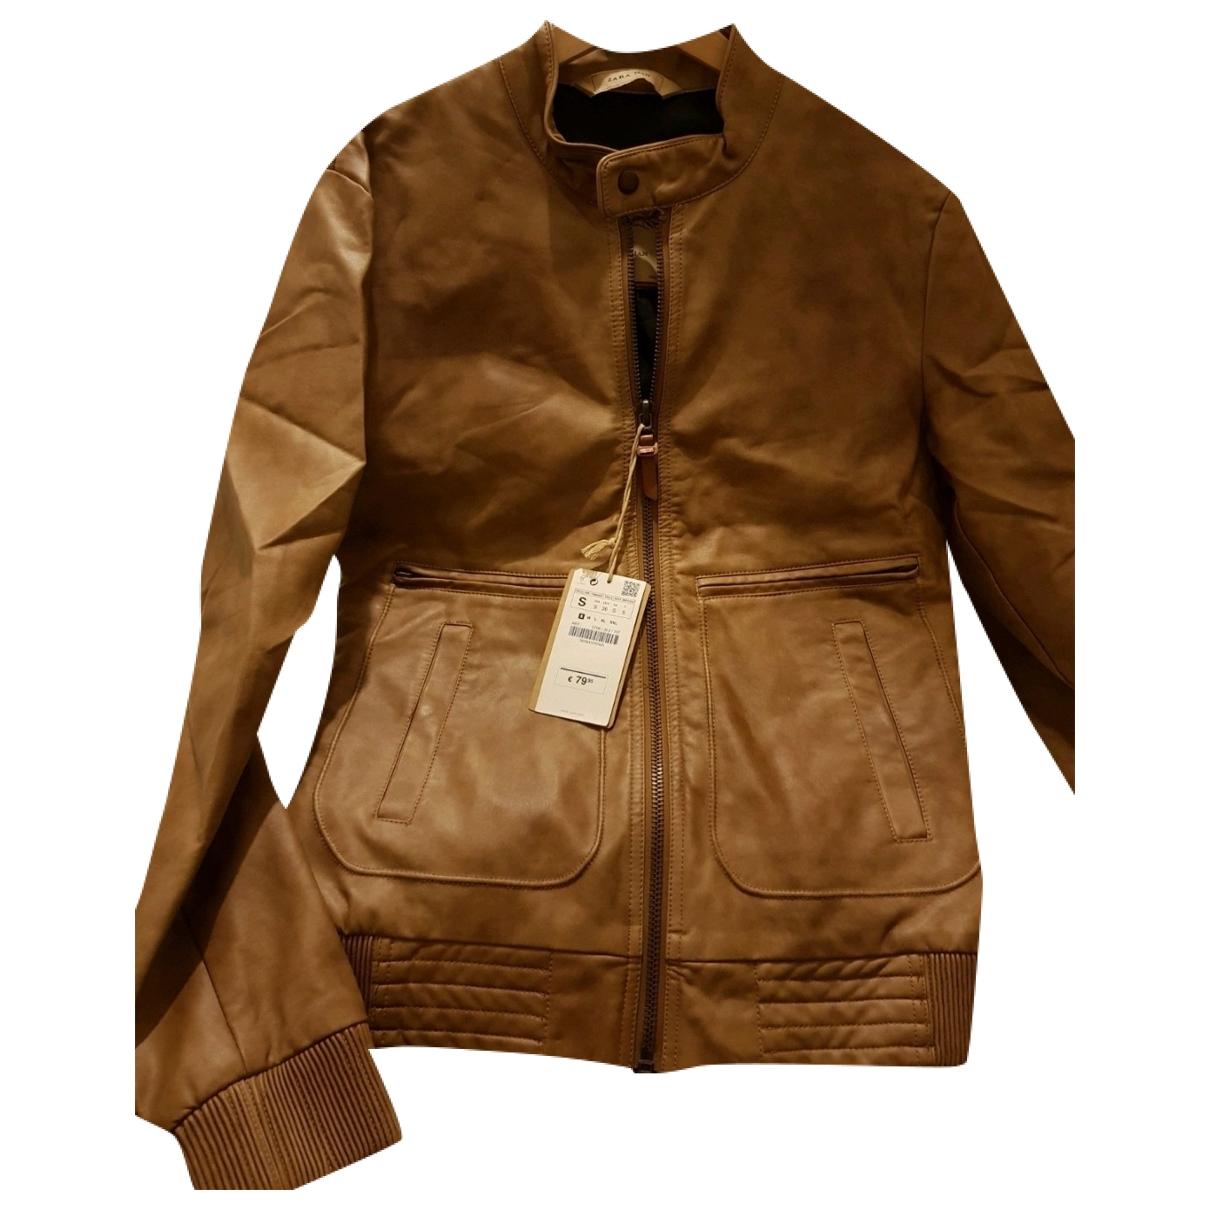 Zara \N Leather jacket  for Men S International